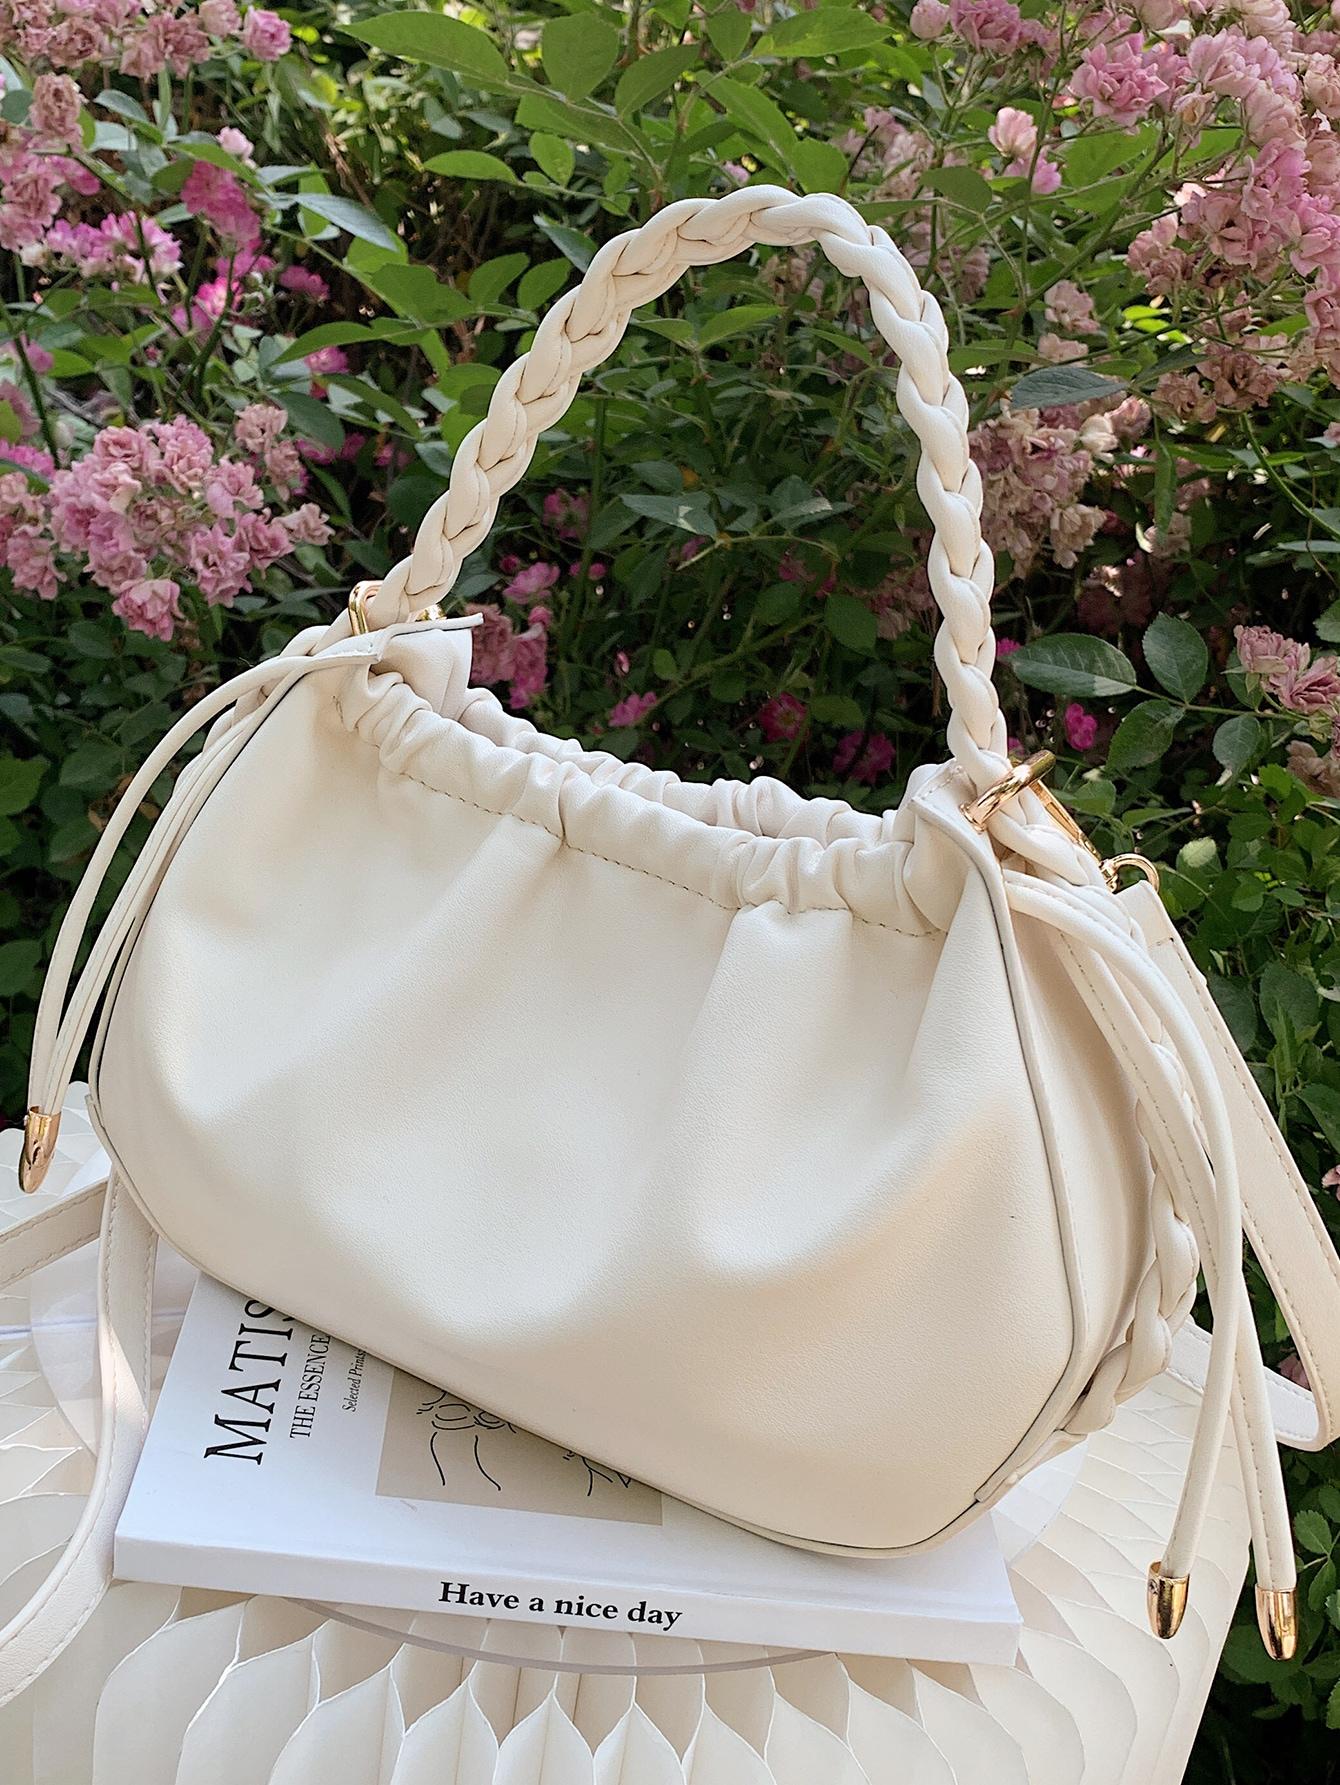 braided handle drawstring satchel bag